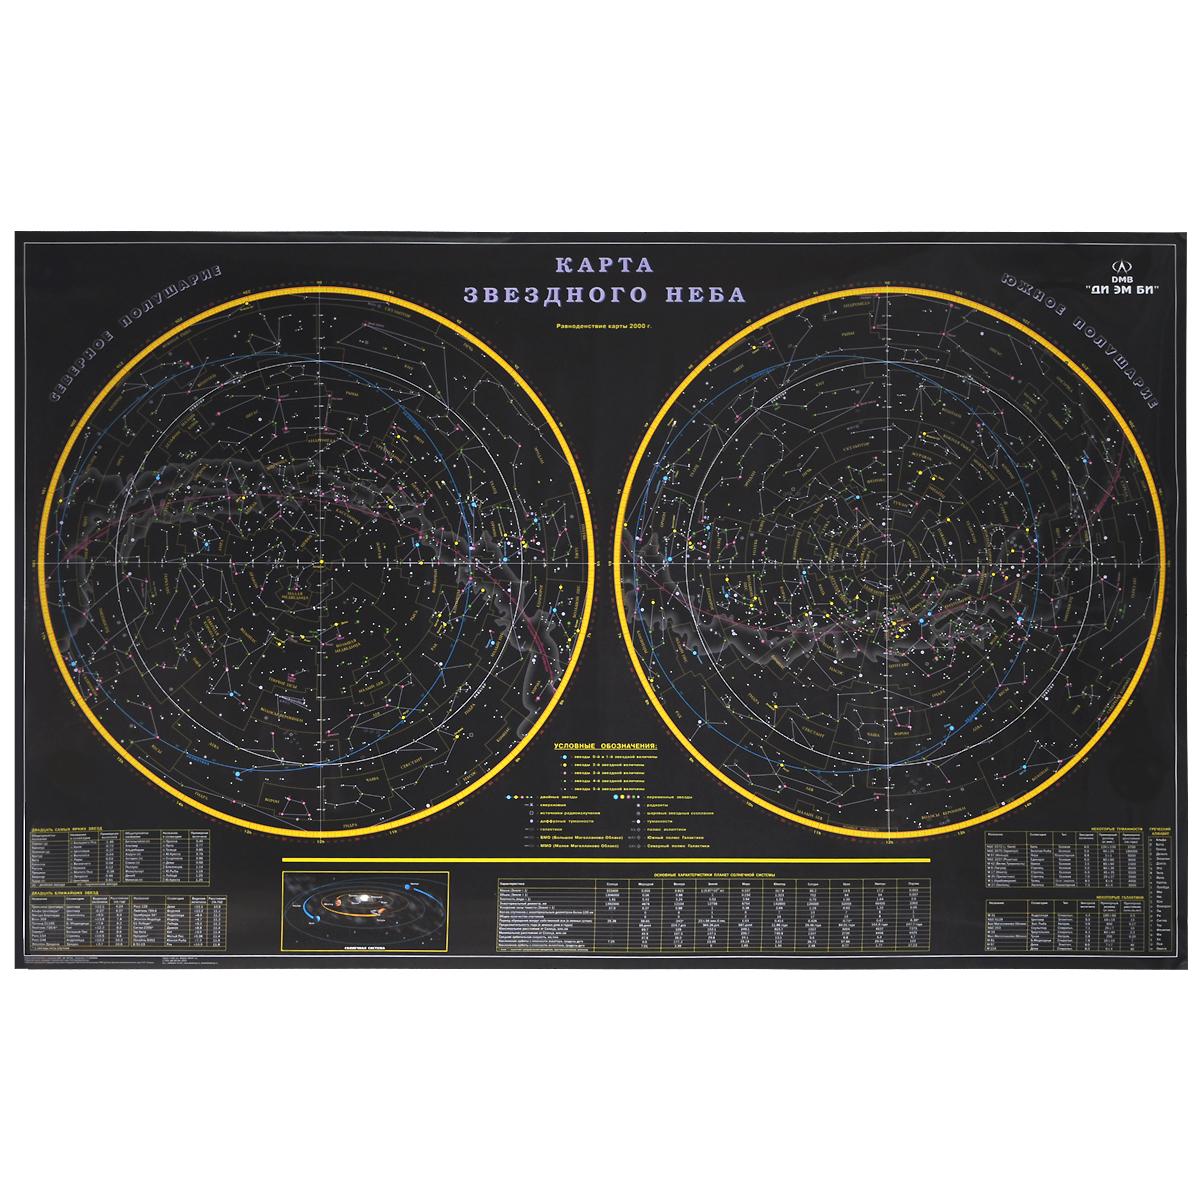 Карта звездного неба проектор звездного неба в зеленограде